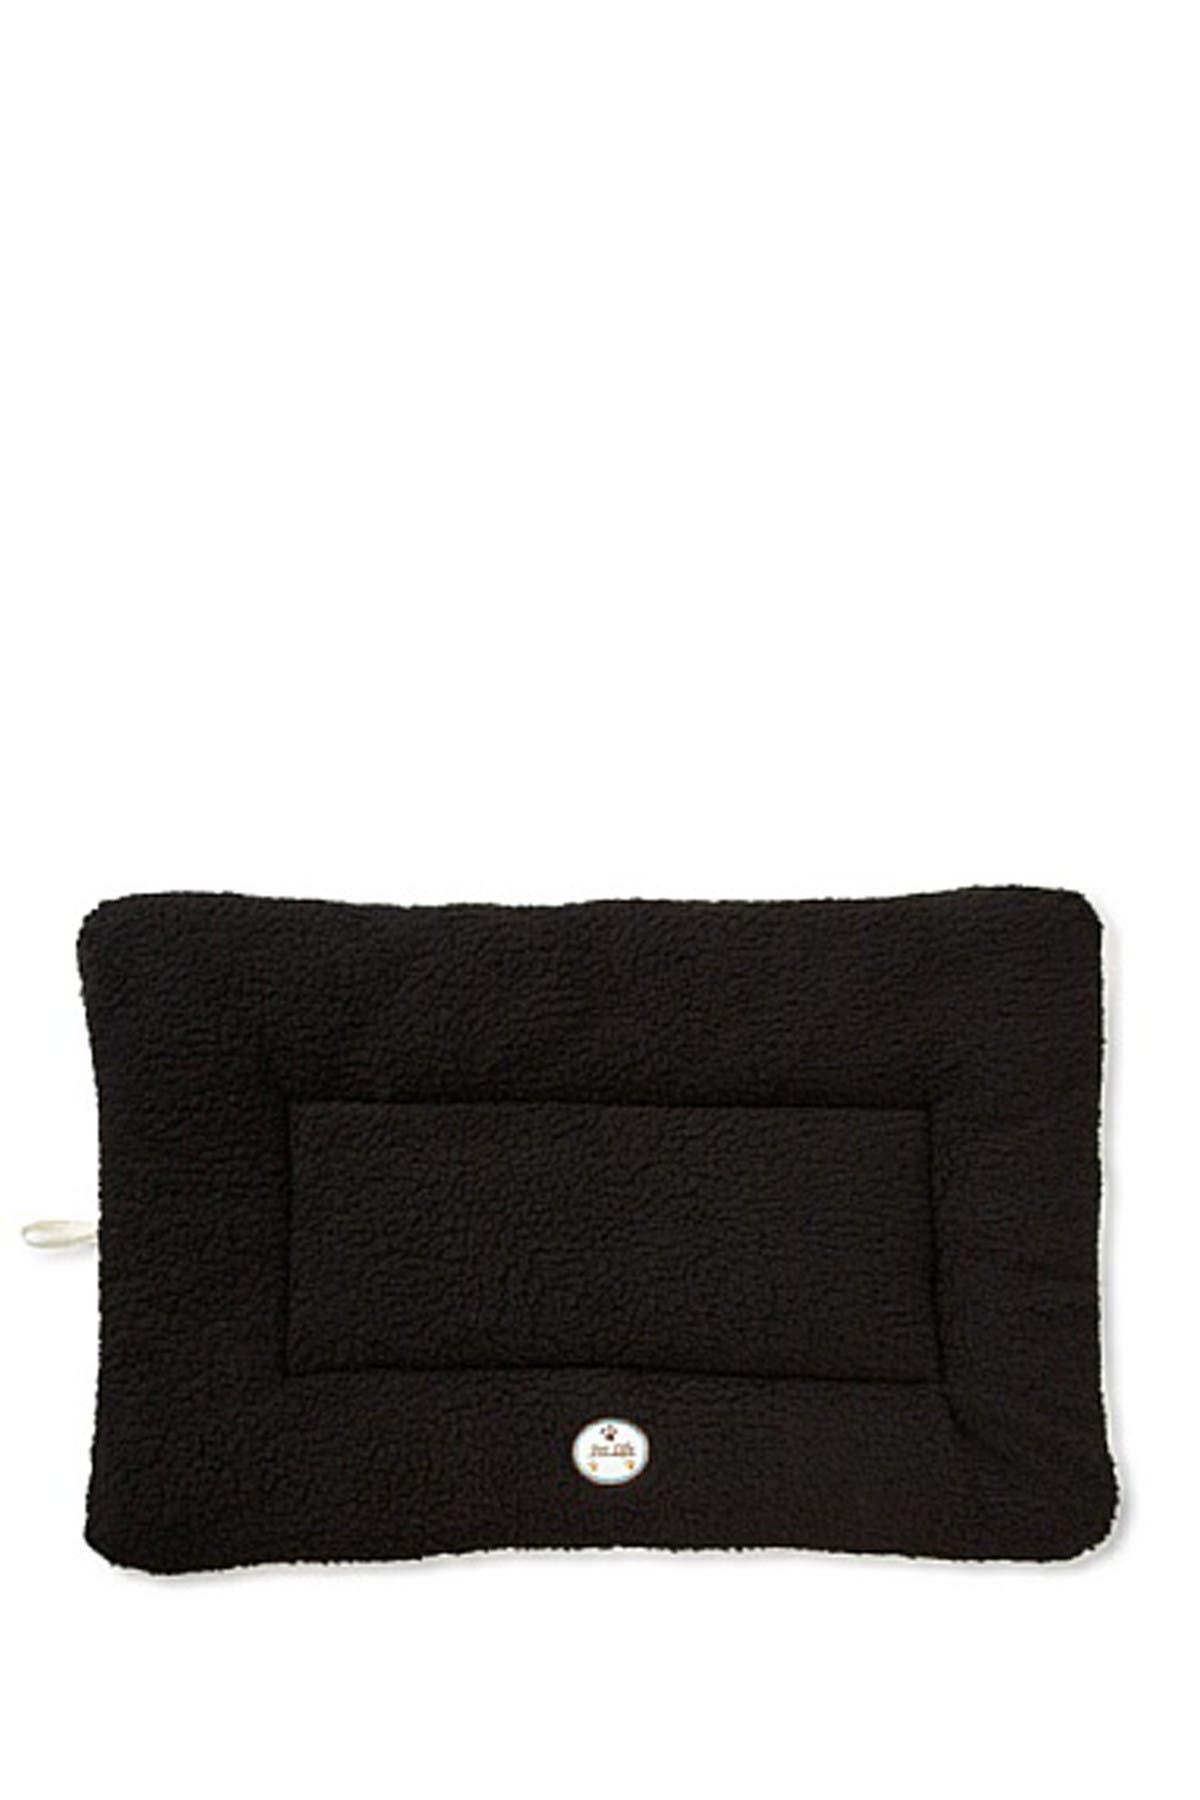 Image of PETKIT Medium Black Reversible Eco-Paw Pet Bed Mat